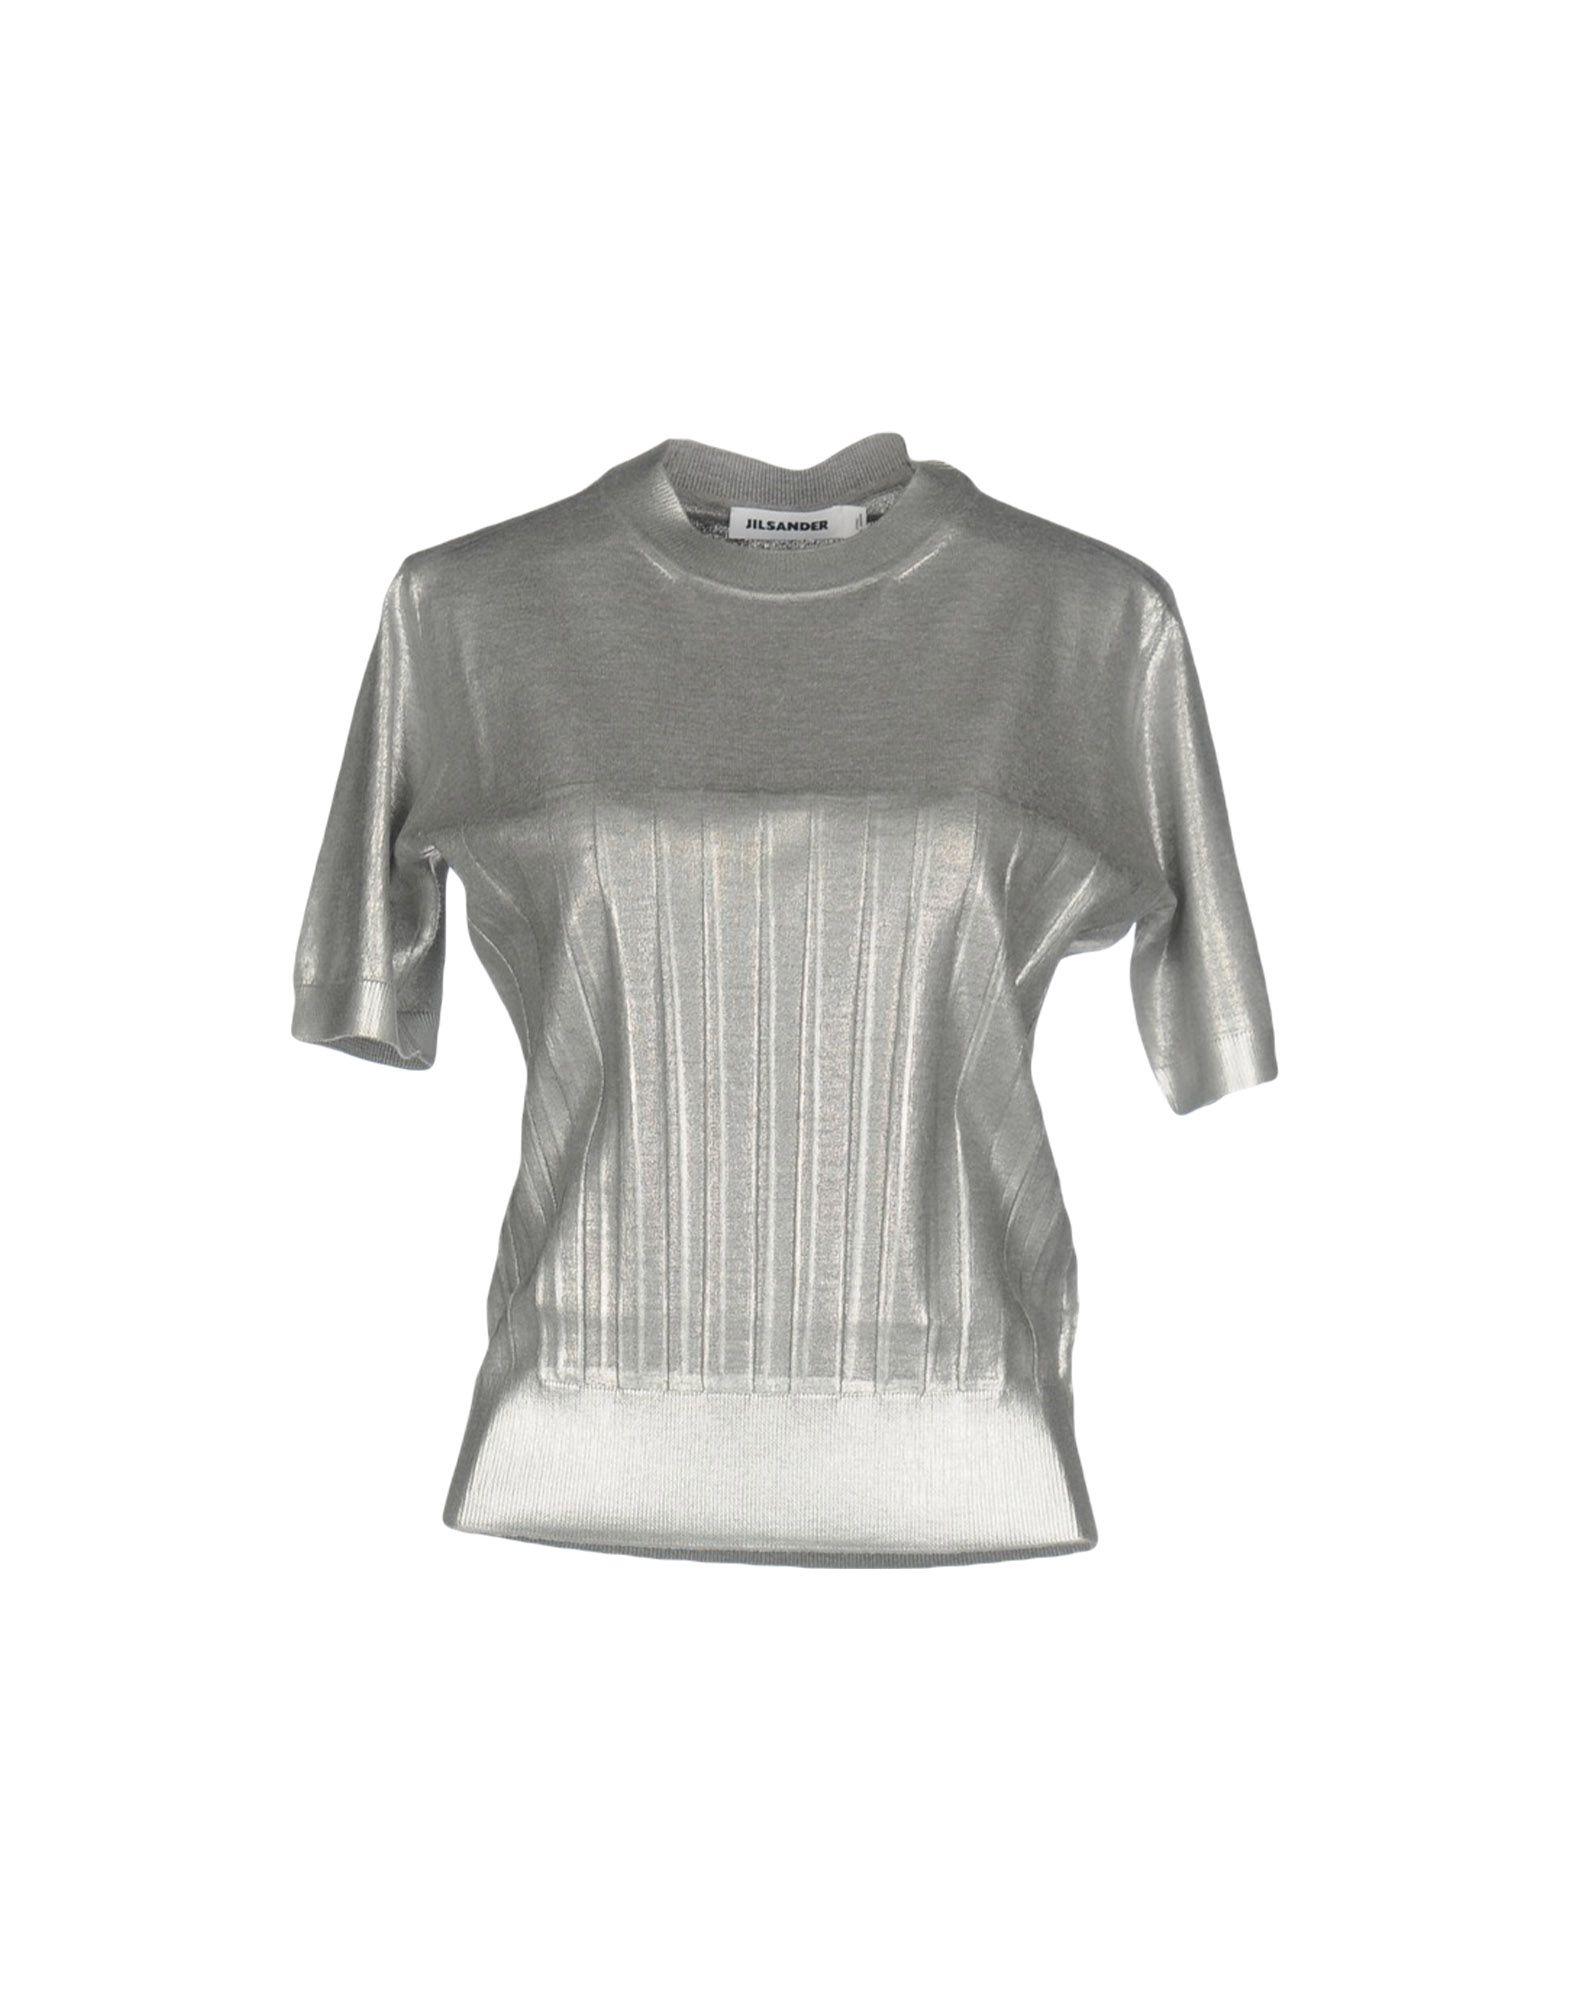 TOPWEAR - Tops Padì Couture Outlet Find Great Footlocker Cheap Online Release Dates Cheap Online Cheap Sale Pre Order Explore Online CZugn